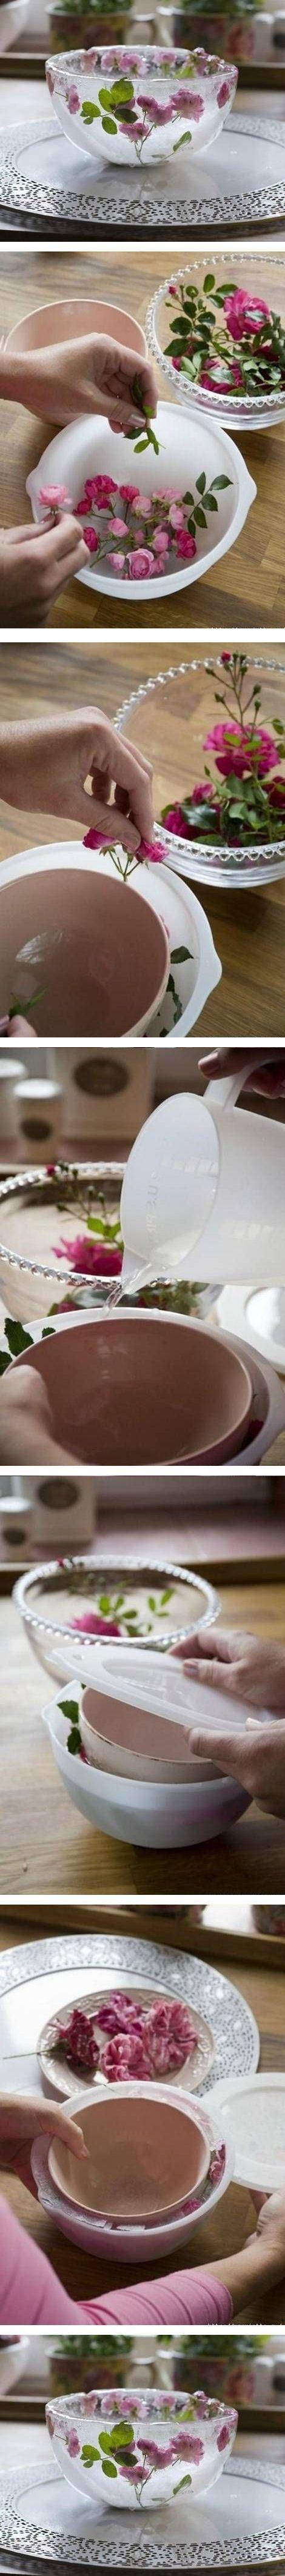 DIY Frozen Flower Bowl / http://www.himisspuff.com/edible-flowers-wedding-ideas/2/